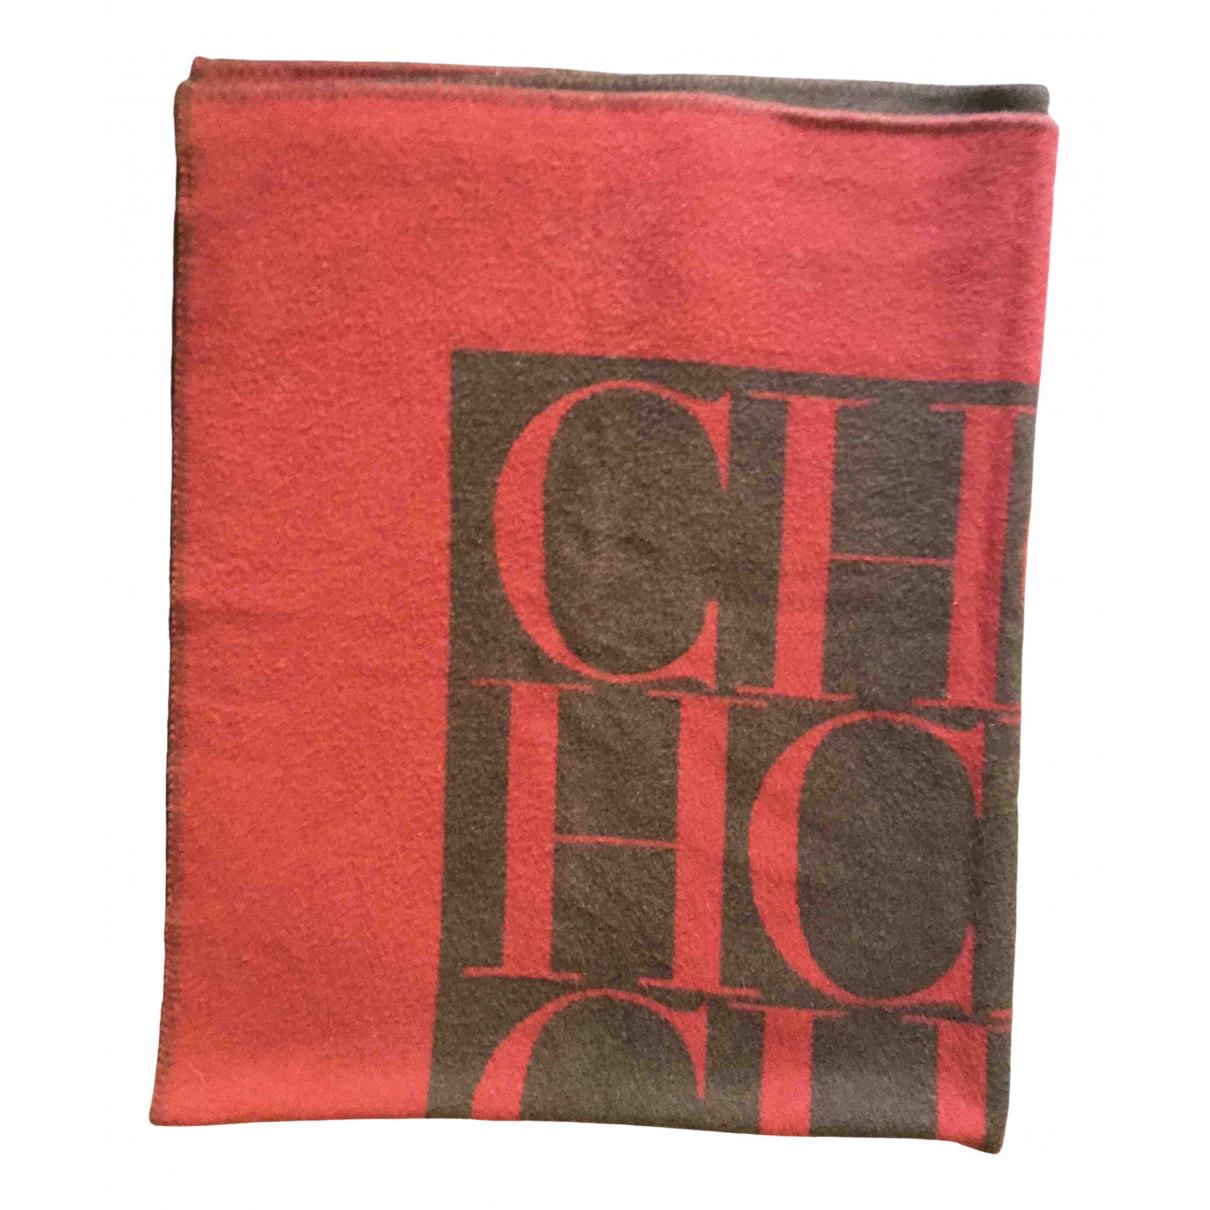 Textil de hogar de Lana Carolina Herrera